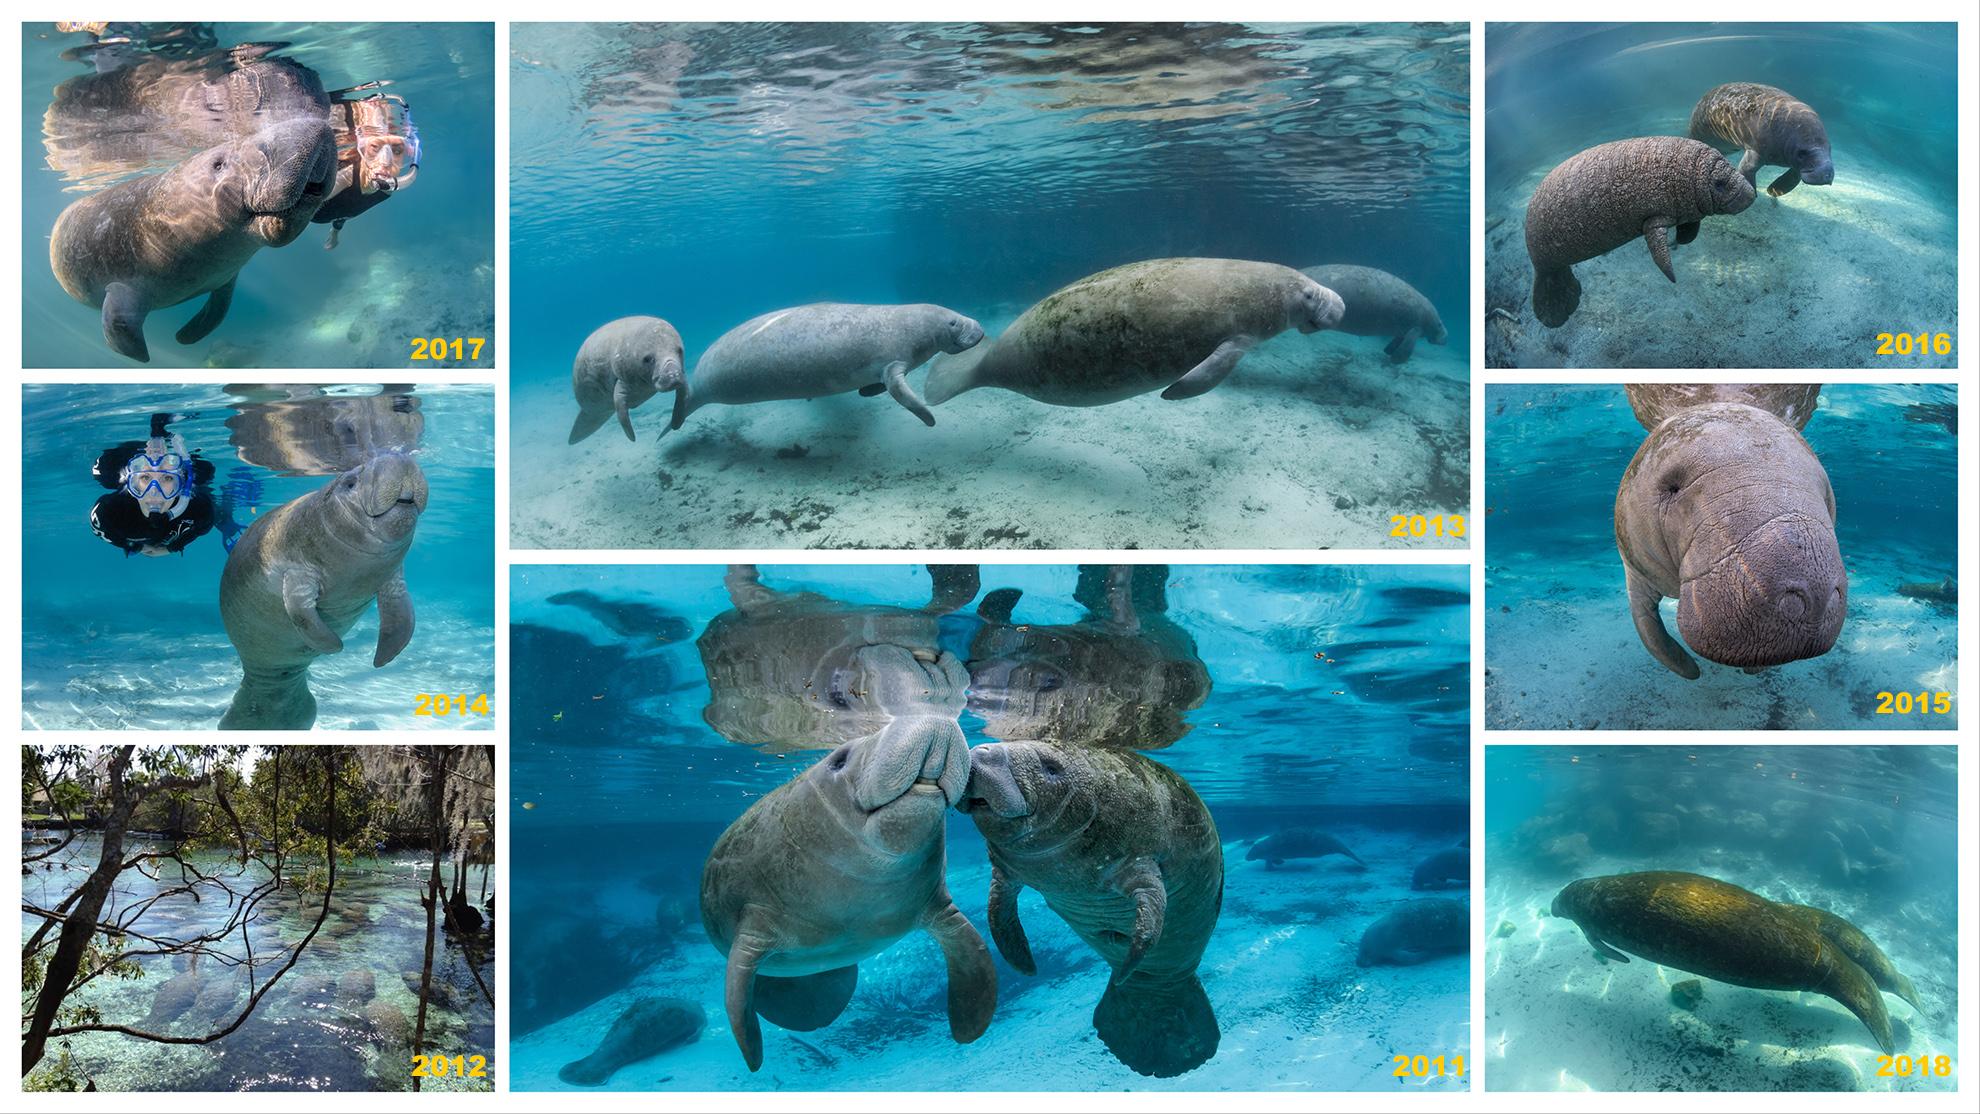 Bday manatees,©Carol Grant - oceangrant.com